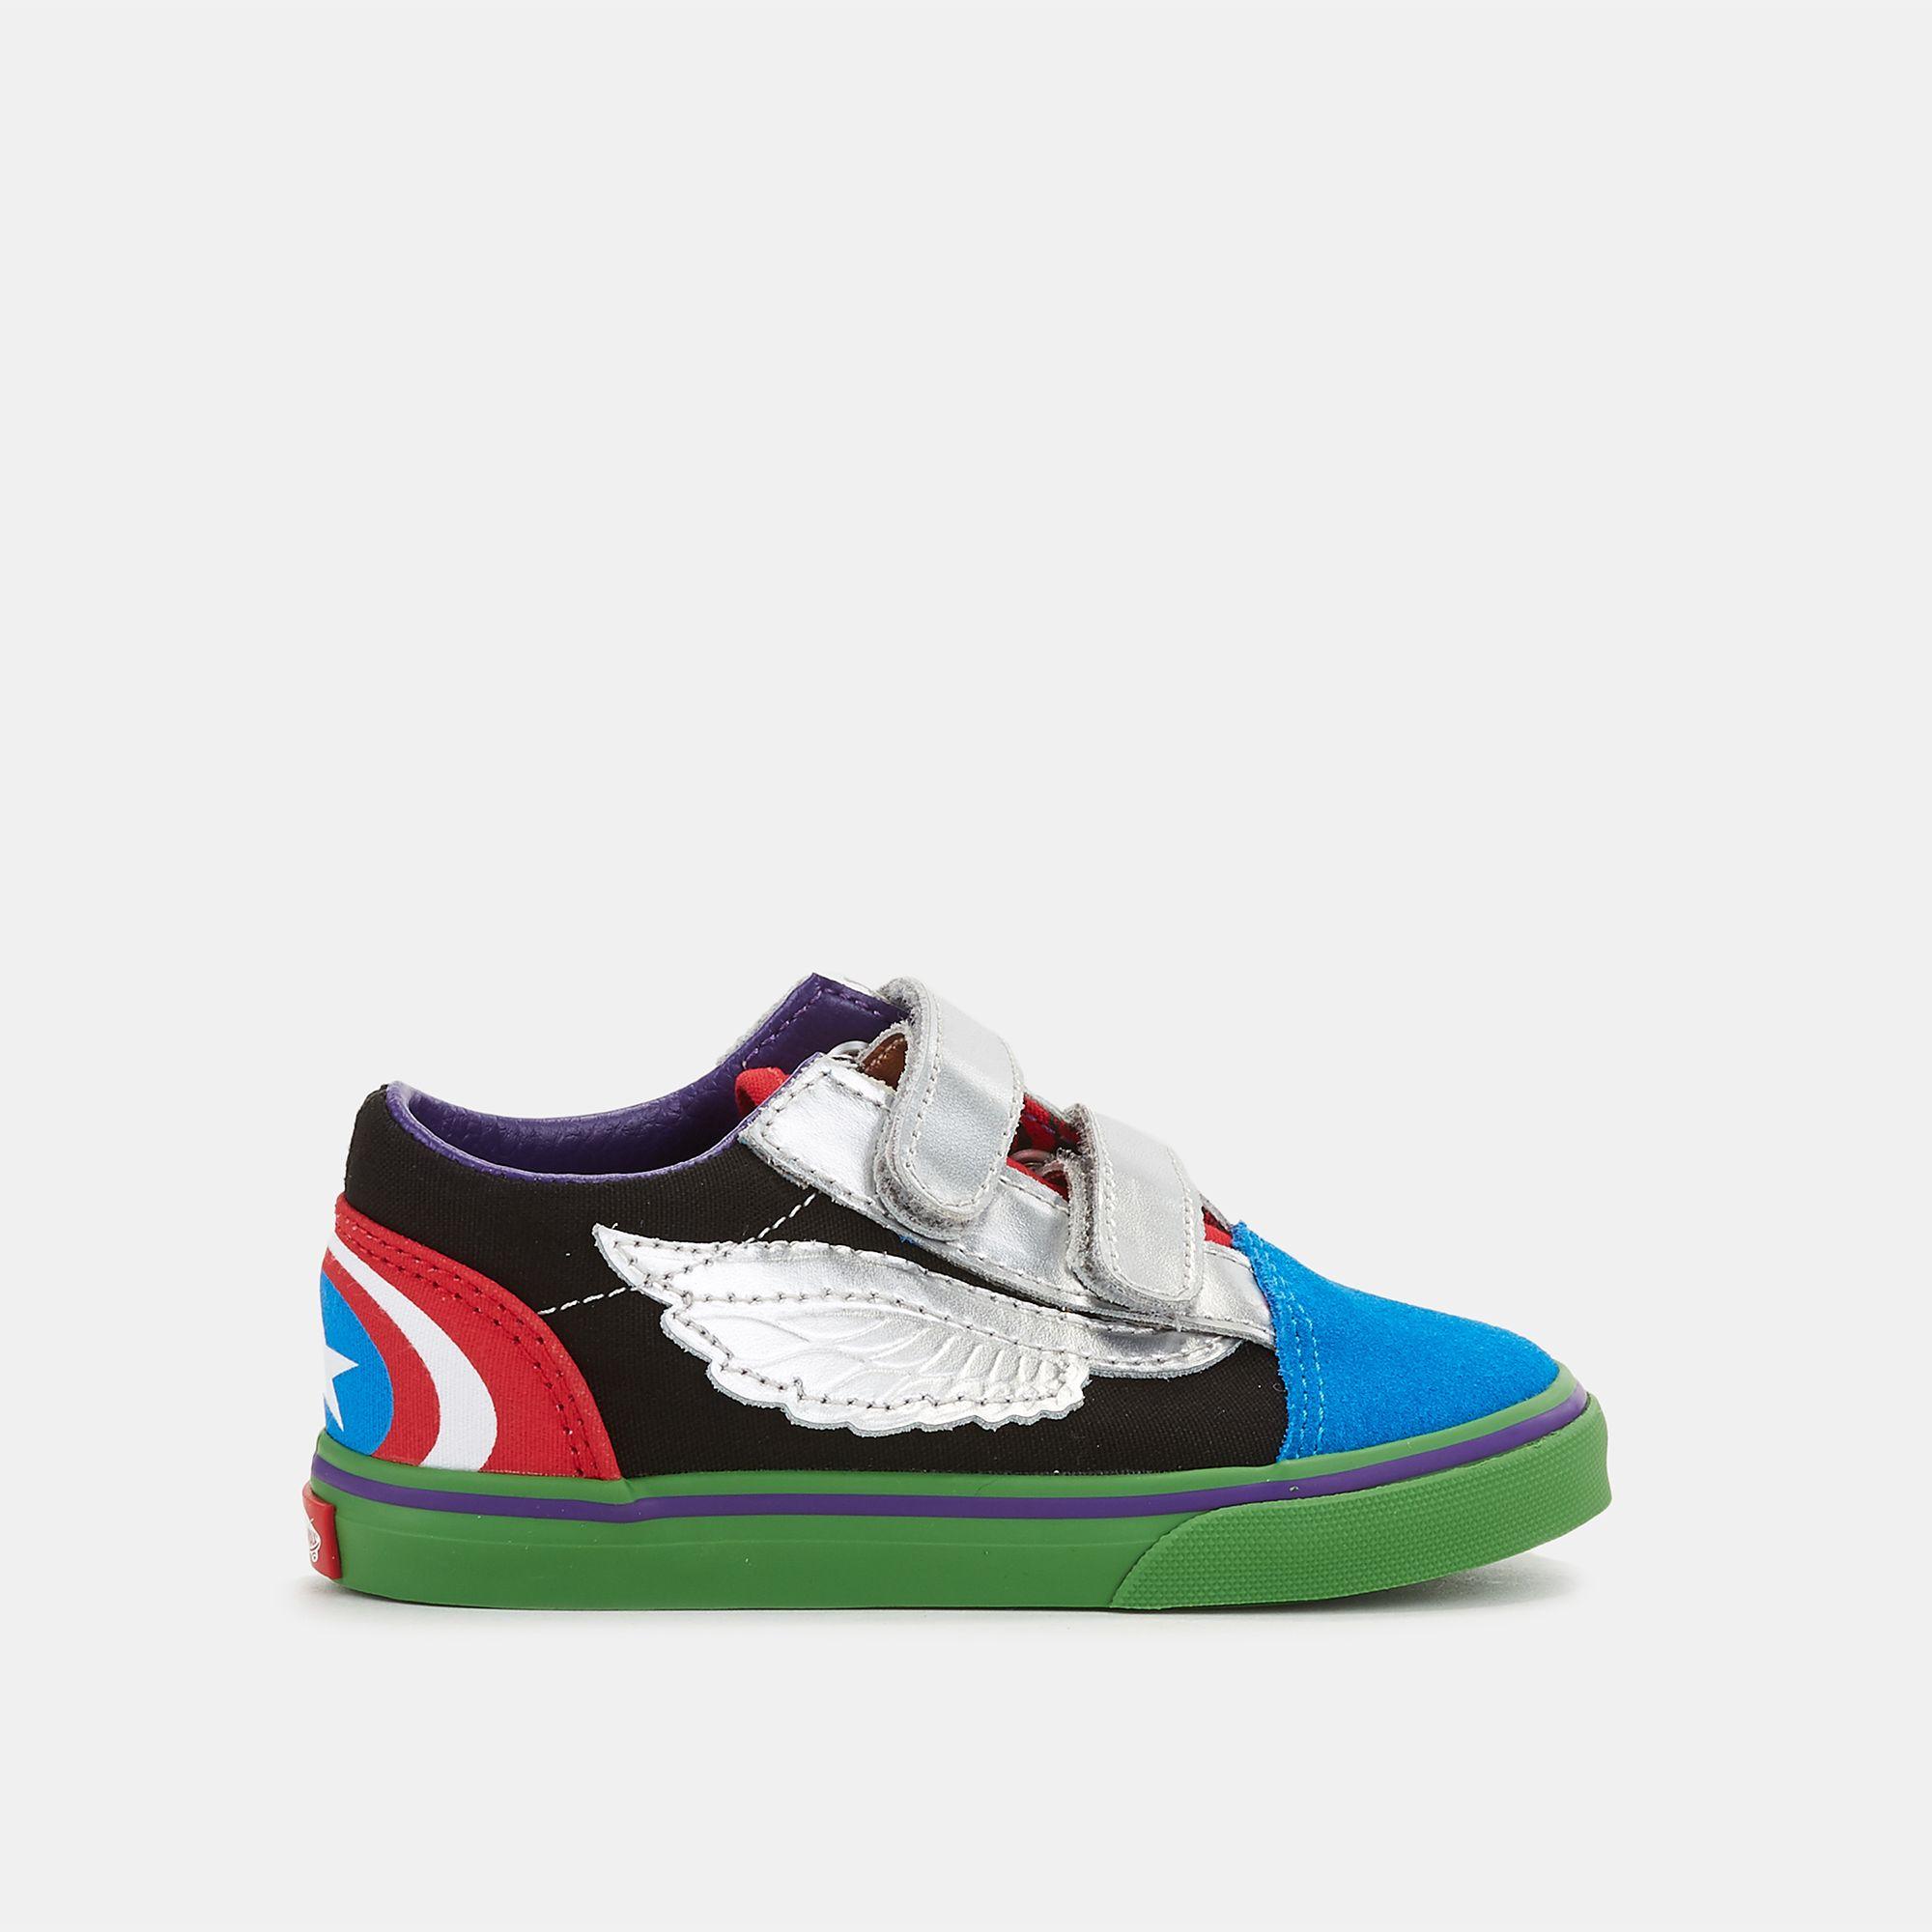 ec3e7d4853 Vans Kids  x Marvel Old Skool Shoe